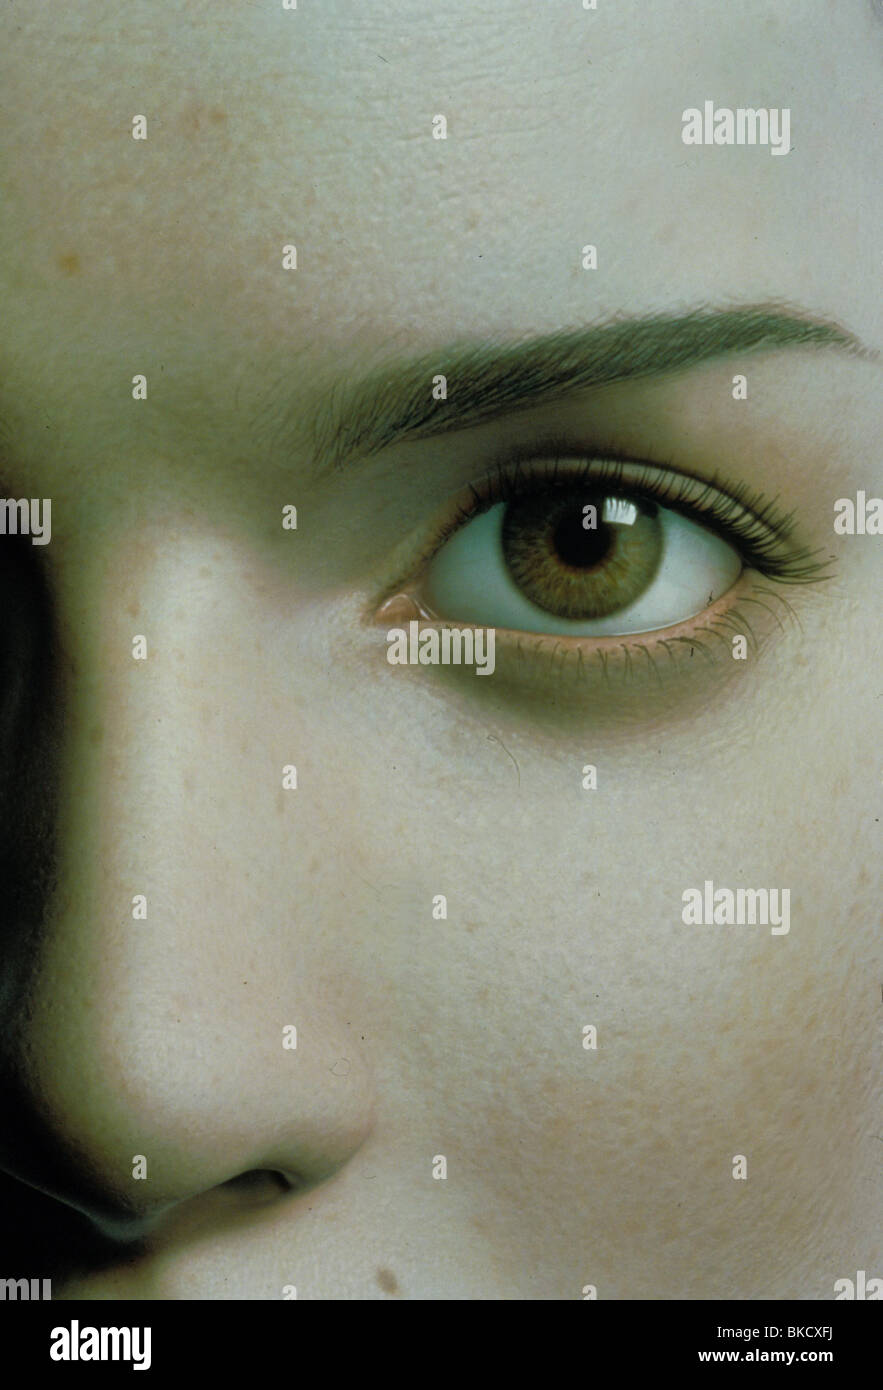 FINAL FANTASY : THE SPIRITS WITHIN (ANI - 2001) ANIMATION FFSW 009 - Stock Image